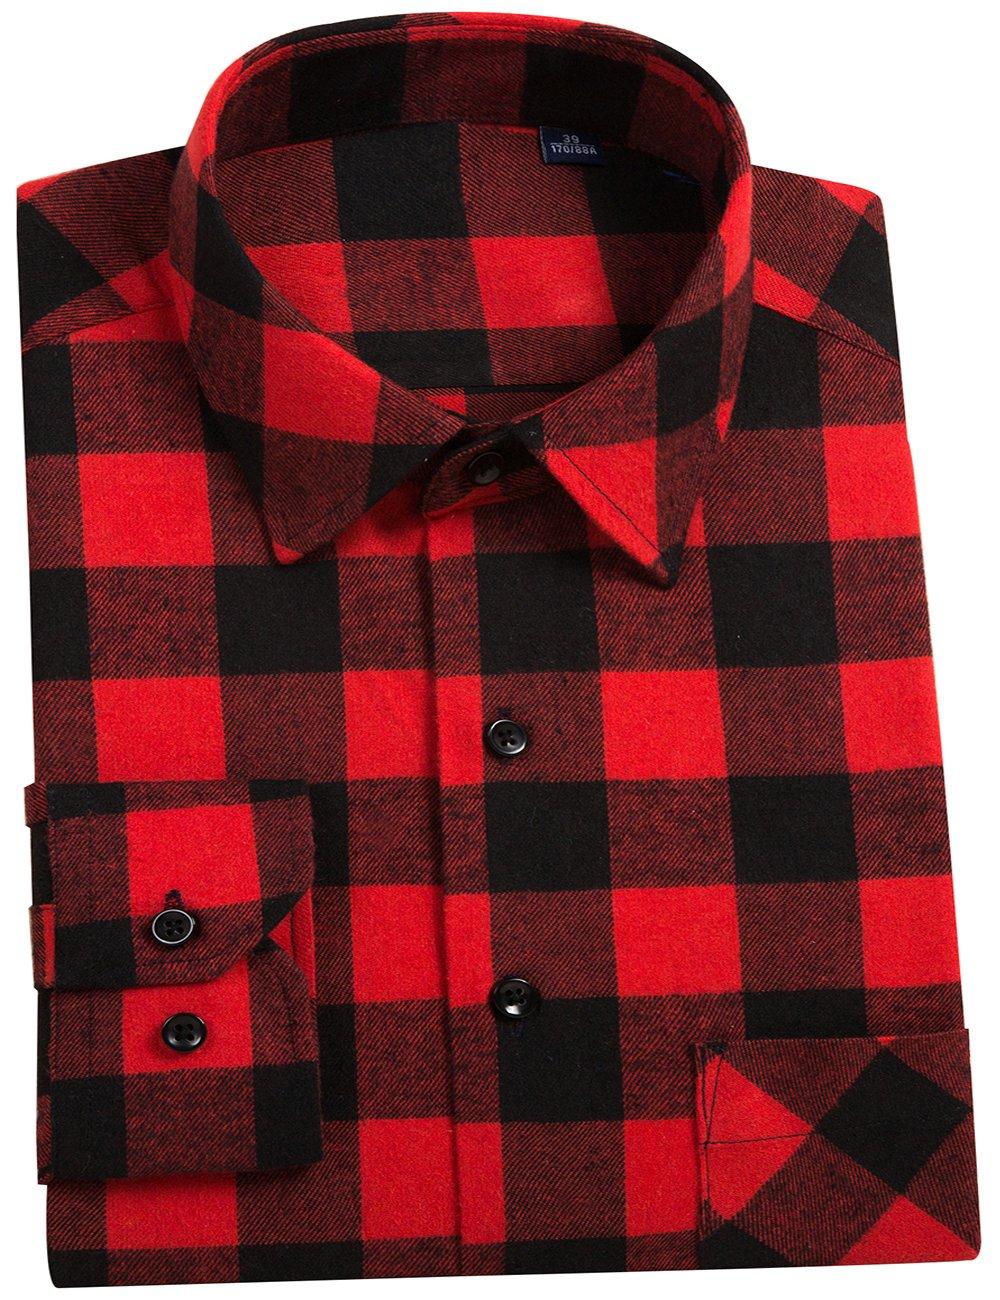 DOKKIA Men's Button Down Buffalo Plaid Checked Long Sleeve Flannel Shirts (Red Black Buffalo, Small)